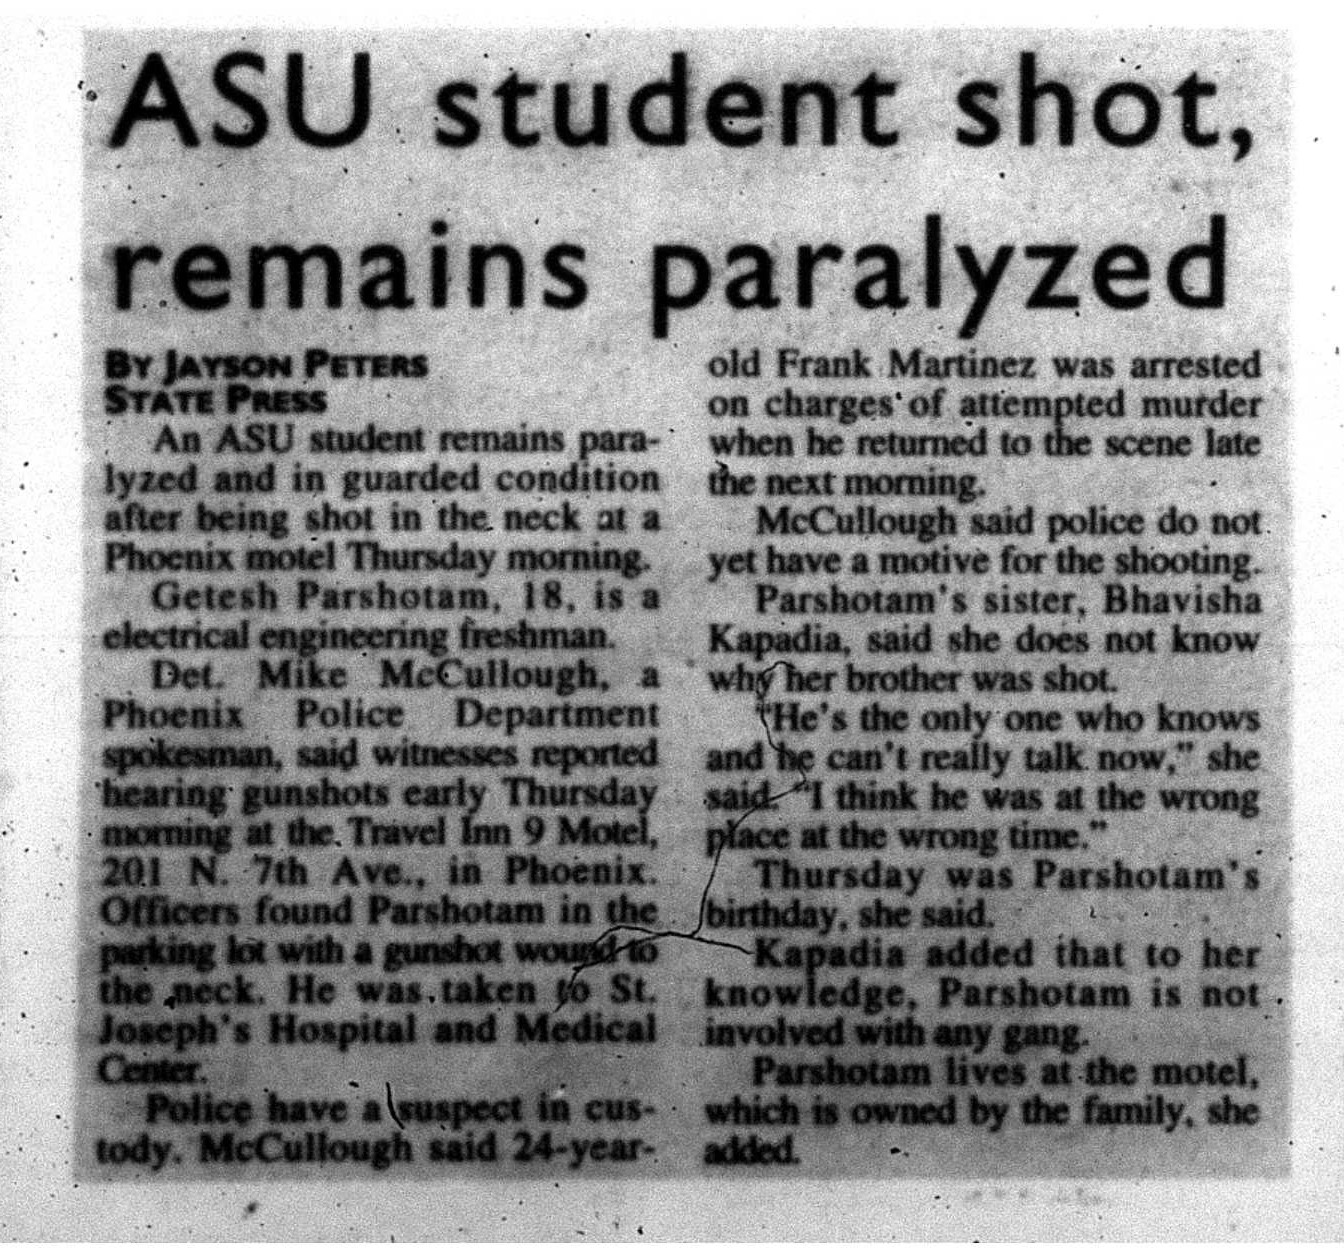 ASU student shot, remains paralyzed